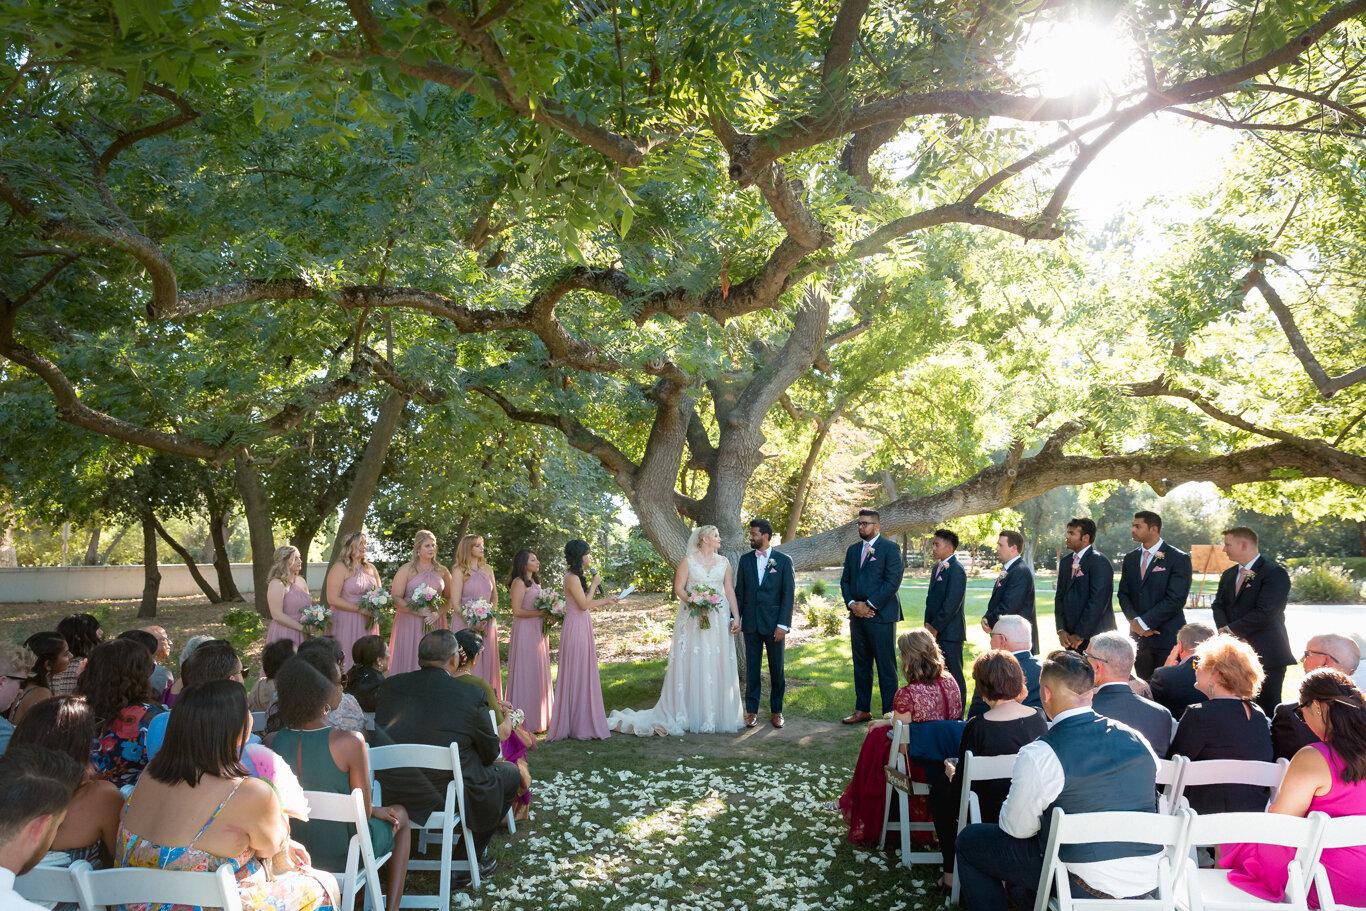 2019.08.24_Emily-Ashir-Wedding-at-the-Maples-5844.jpg